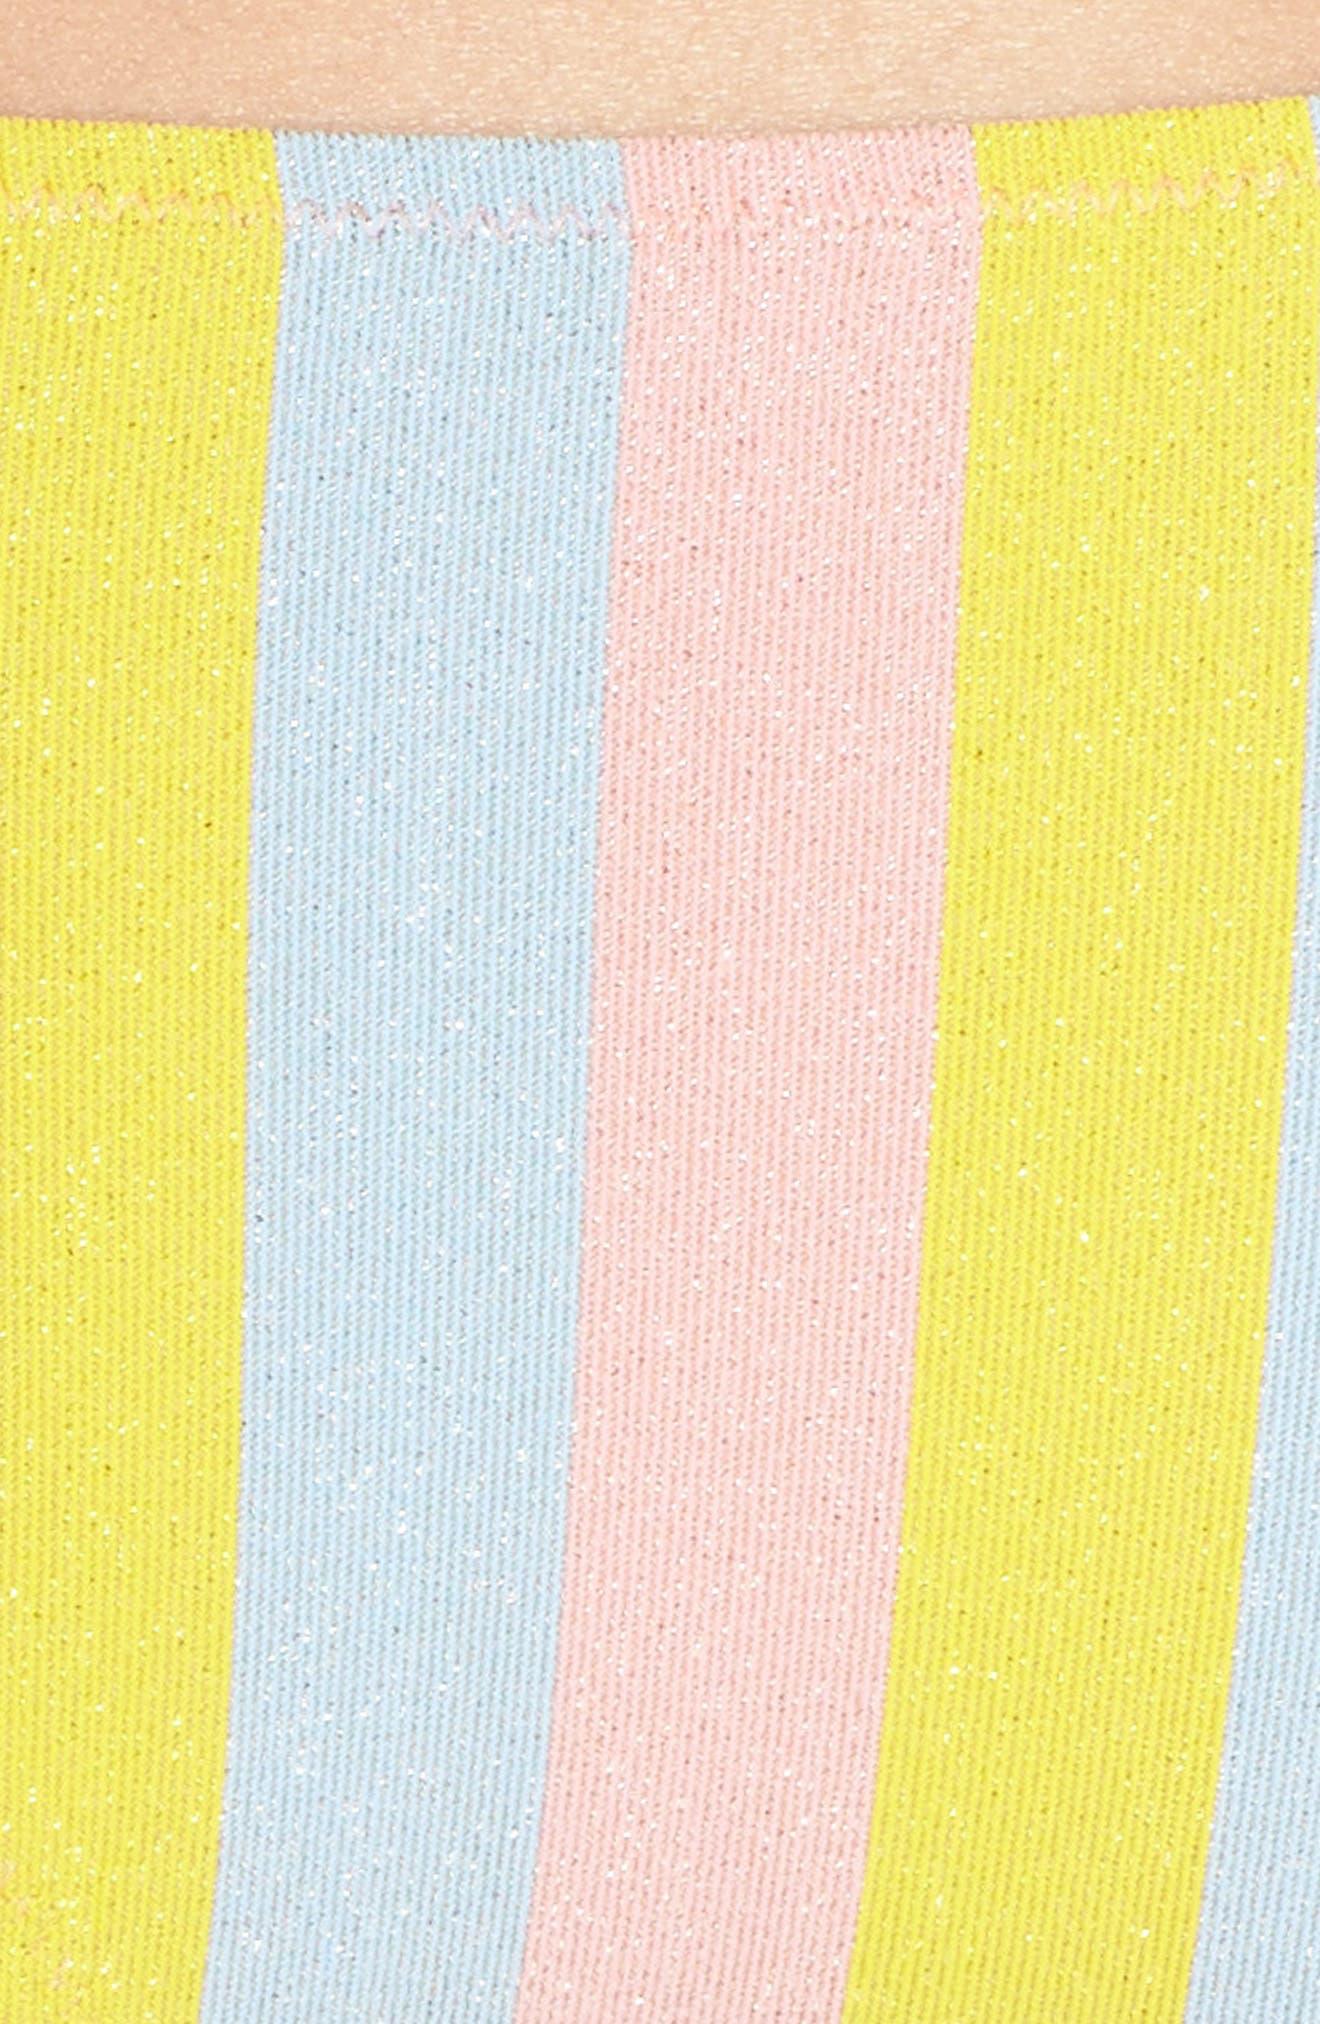 The Rachel Bikini Bottoms,                             Alternate thumbnail 8, color,                             Yellow/ Blue/ Pink